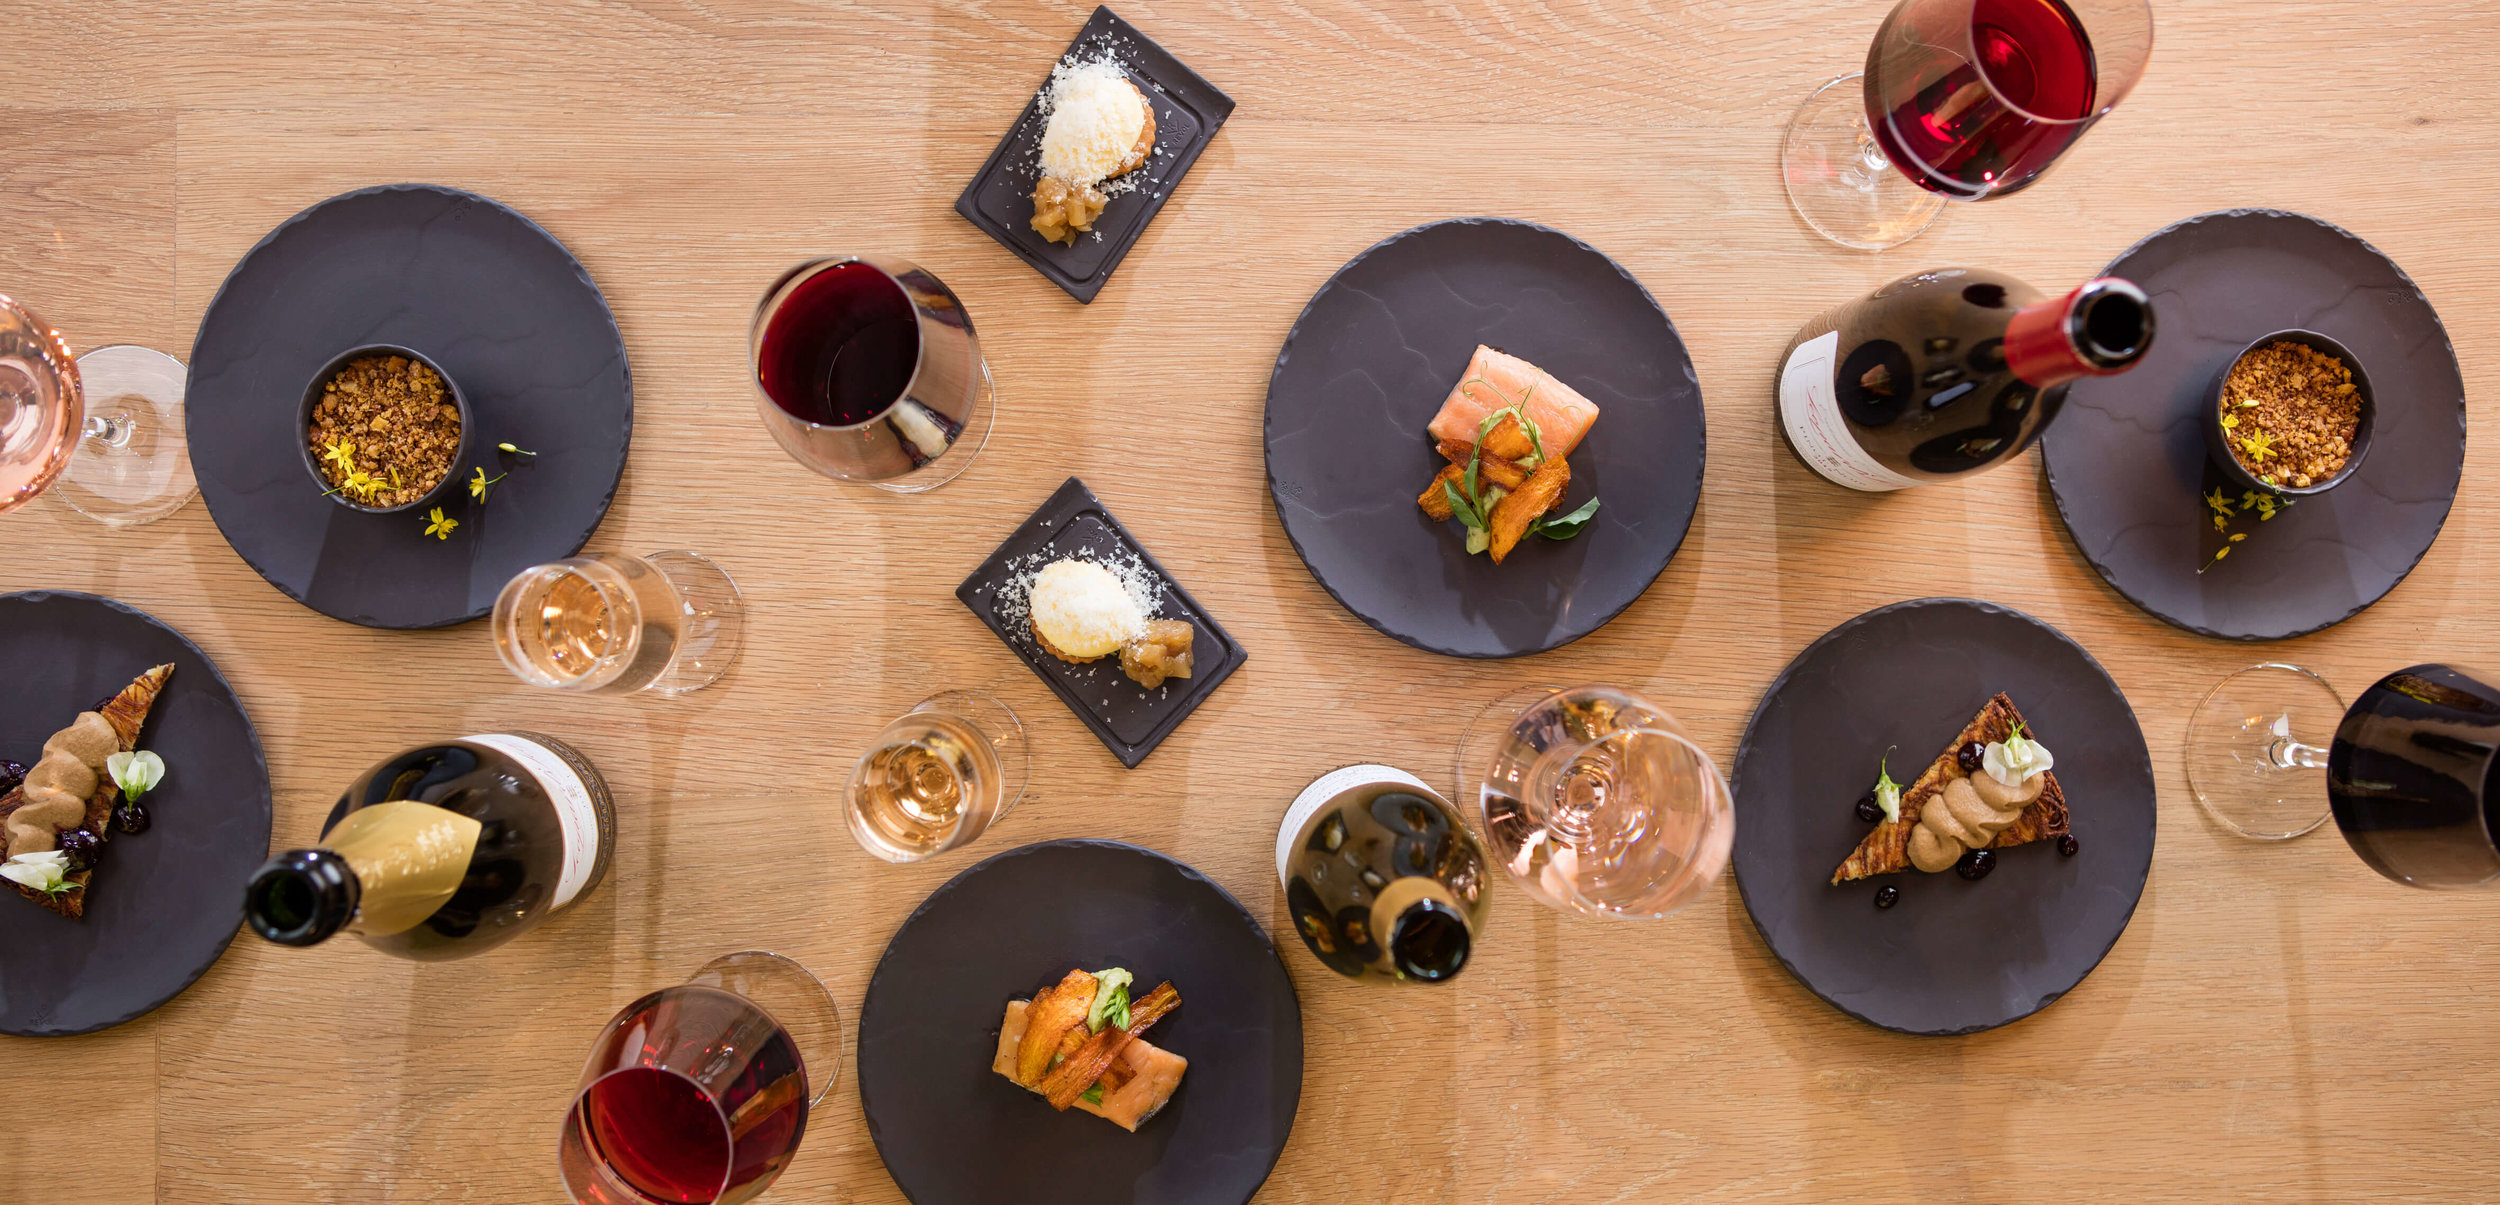 Food-and-Wine-Pairing-Top-Shot-Landscape.jpg